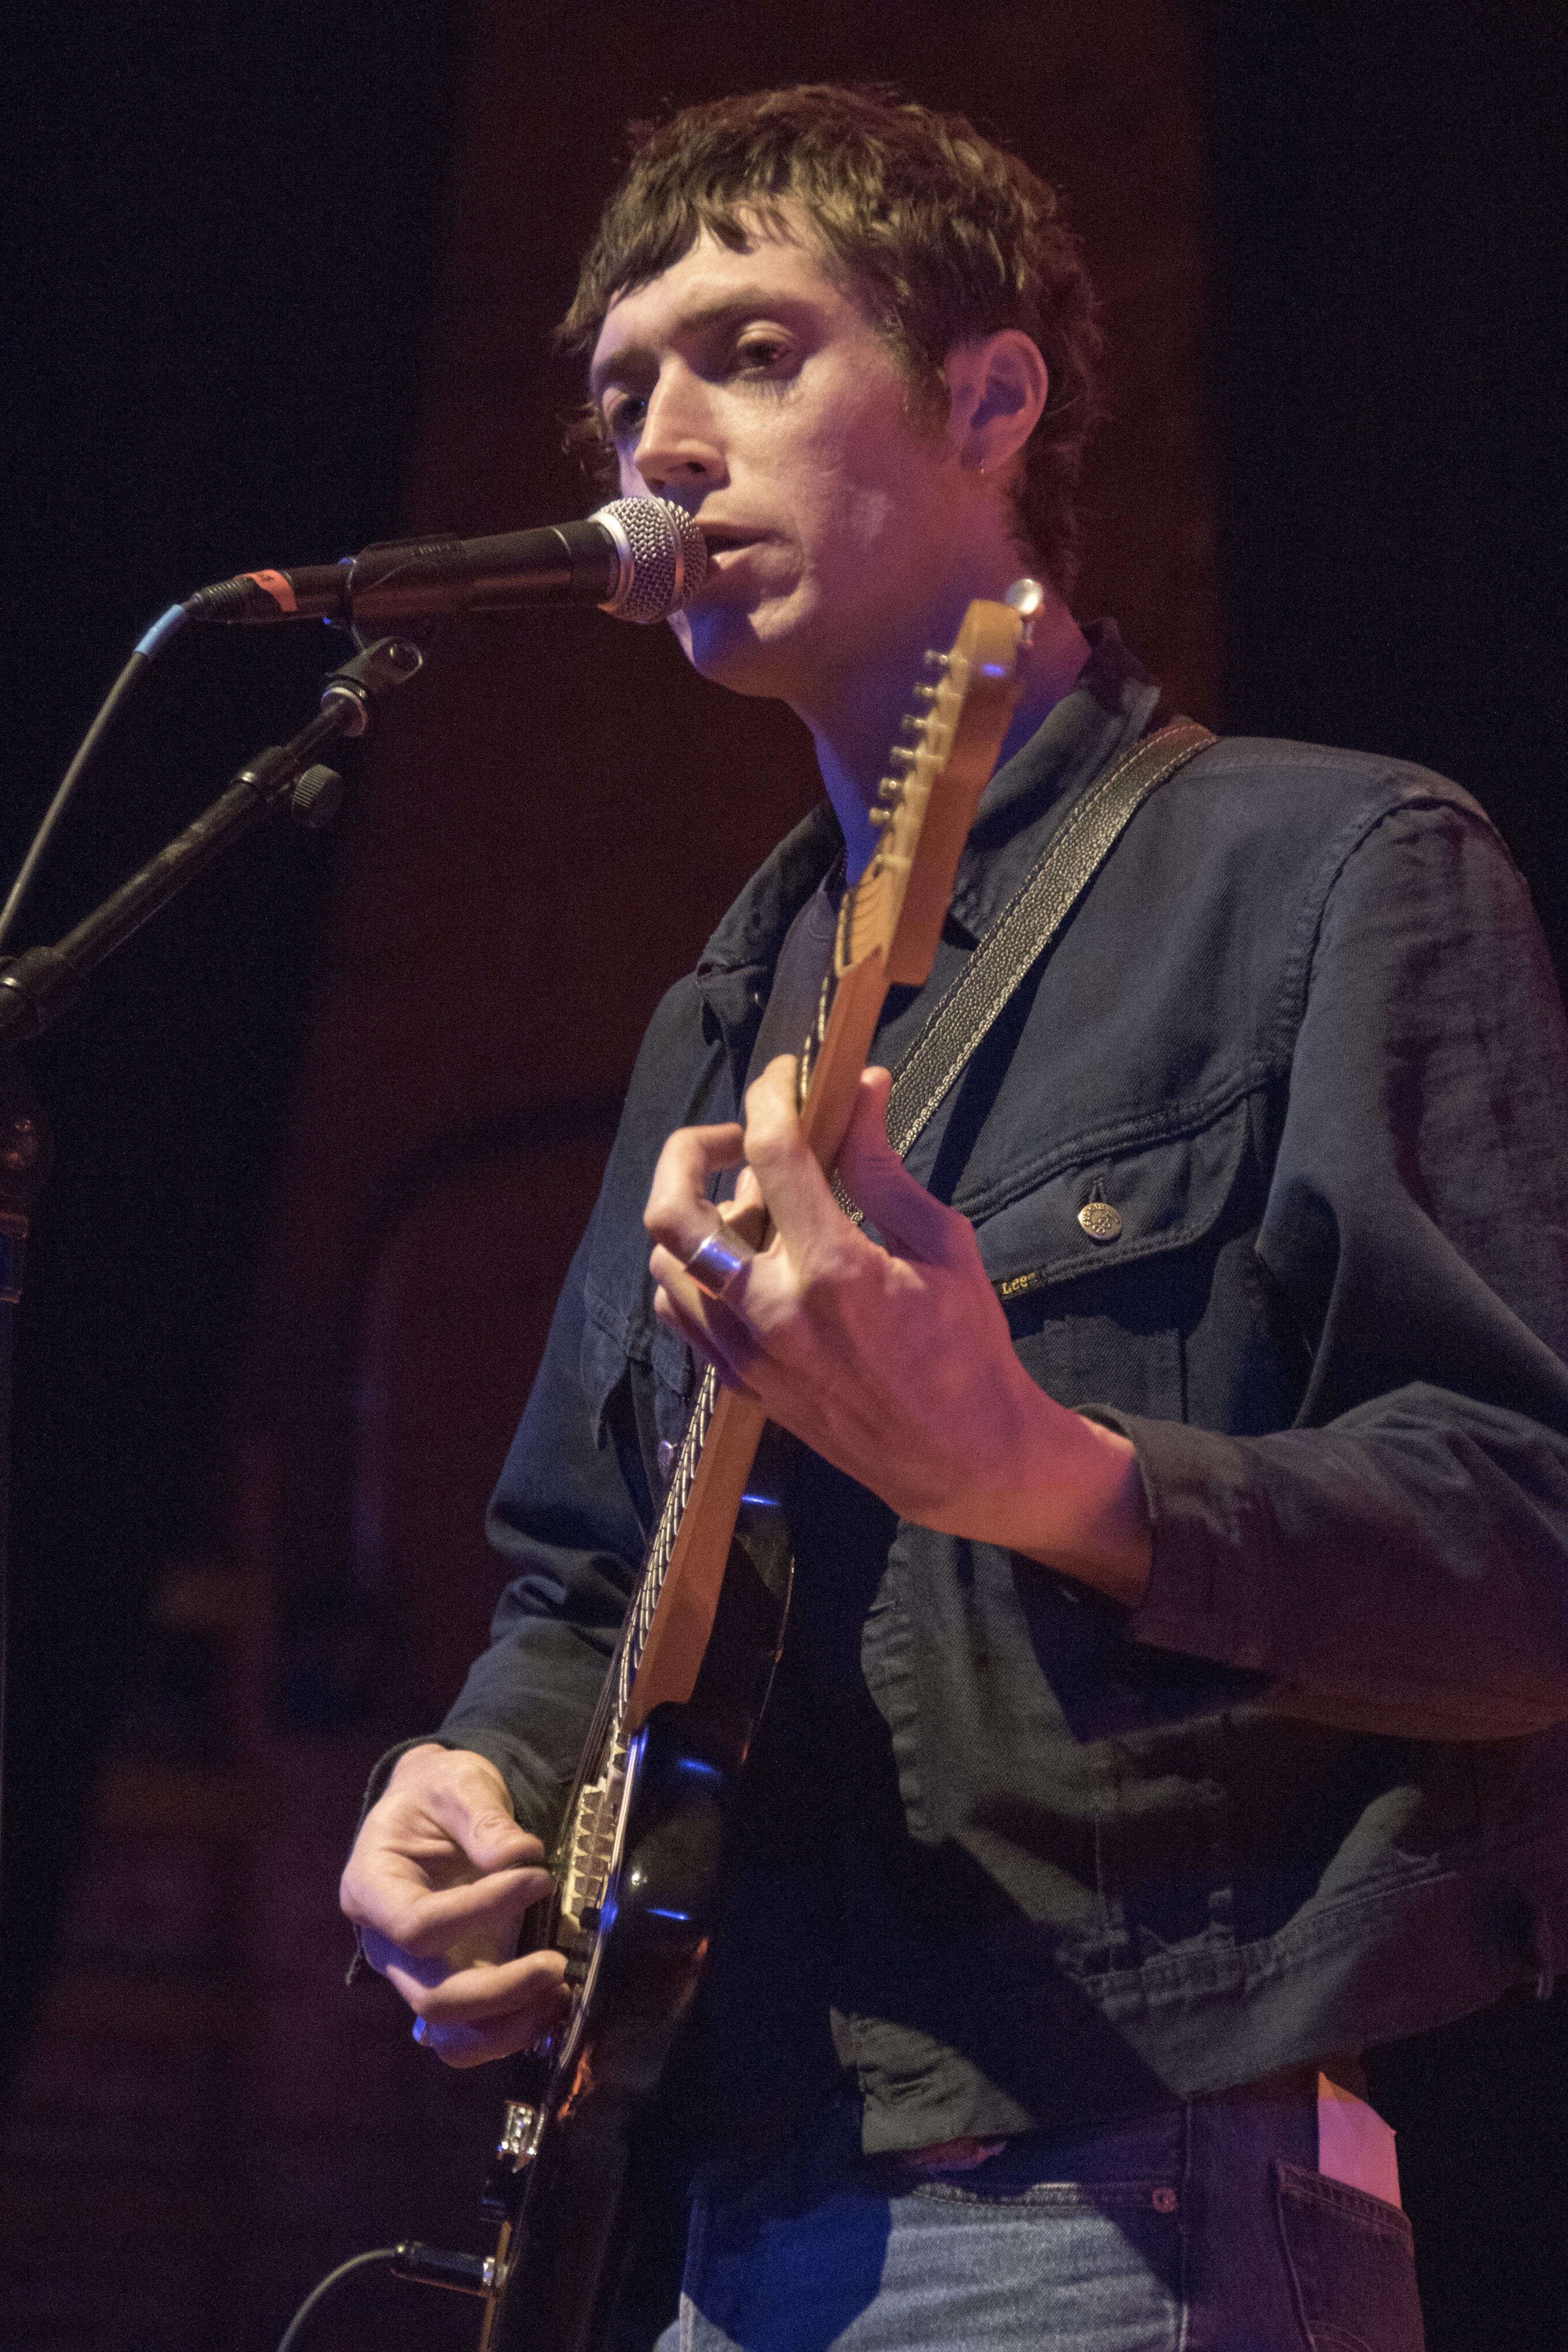 Concert Review: Devendra Banhart